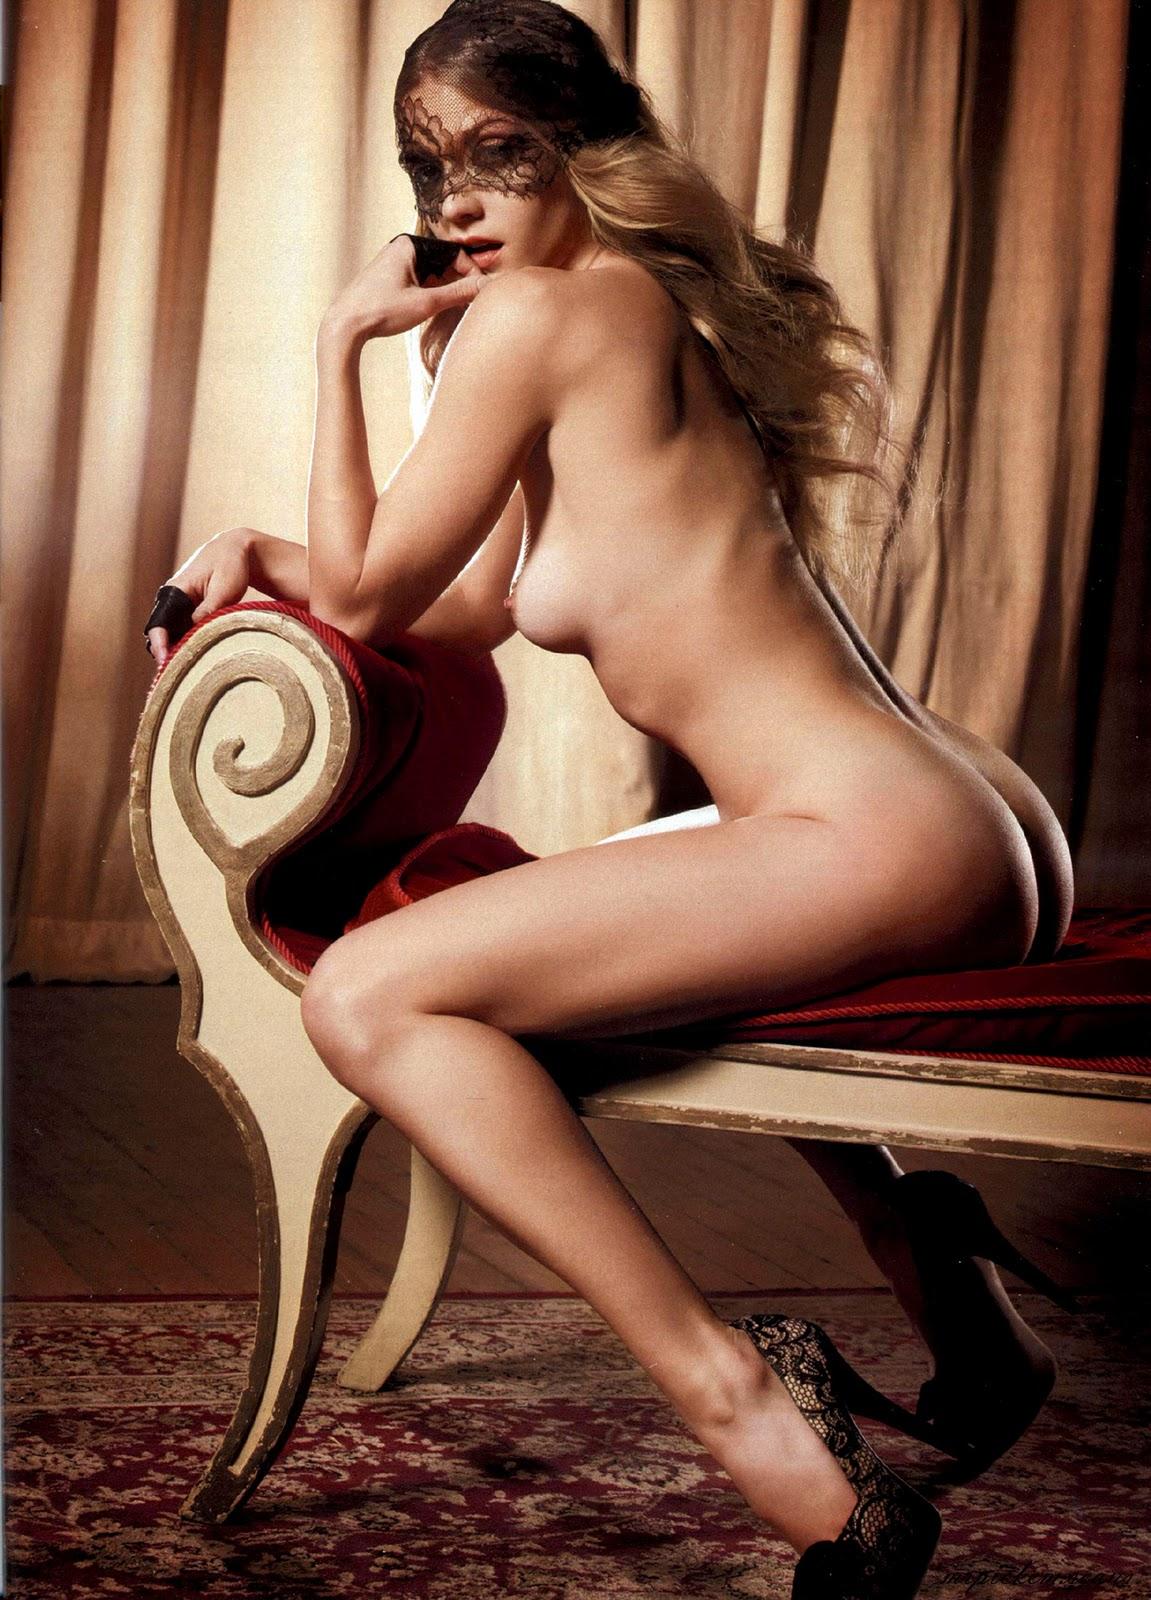 sushmita sen hot nude pussy fuck pics image